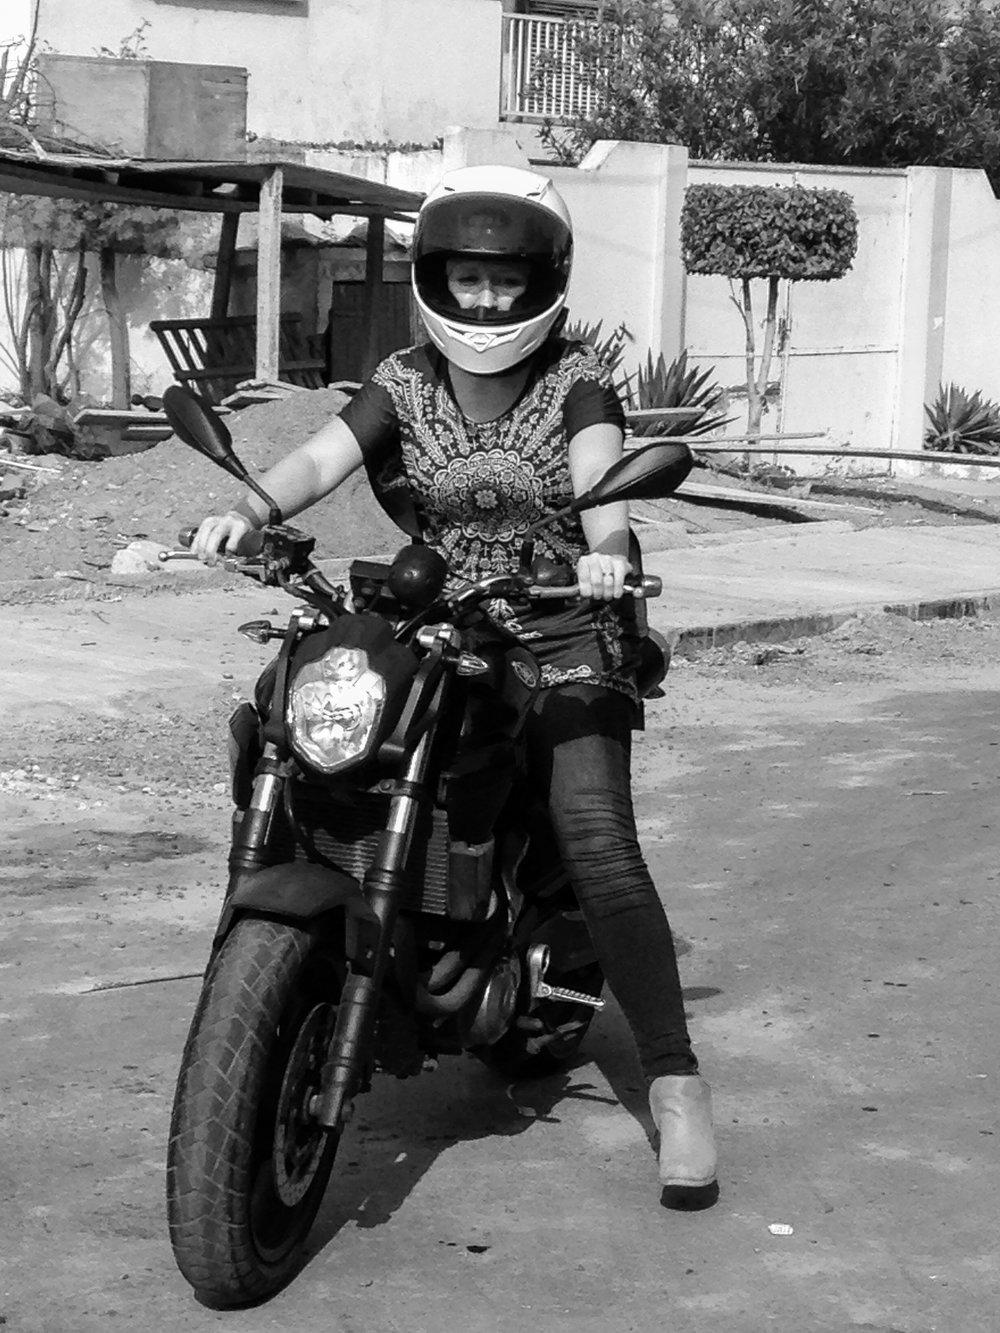 yamaha-mt03-dakar-motorcycle